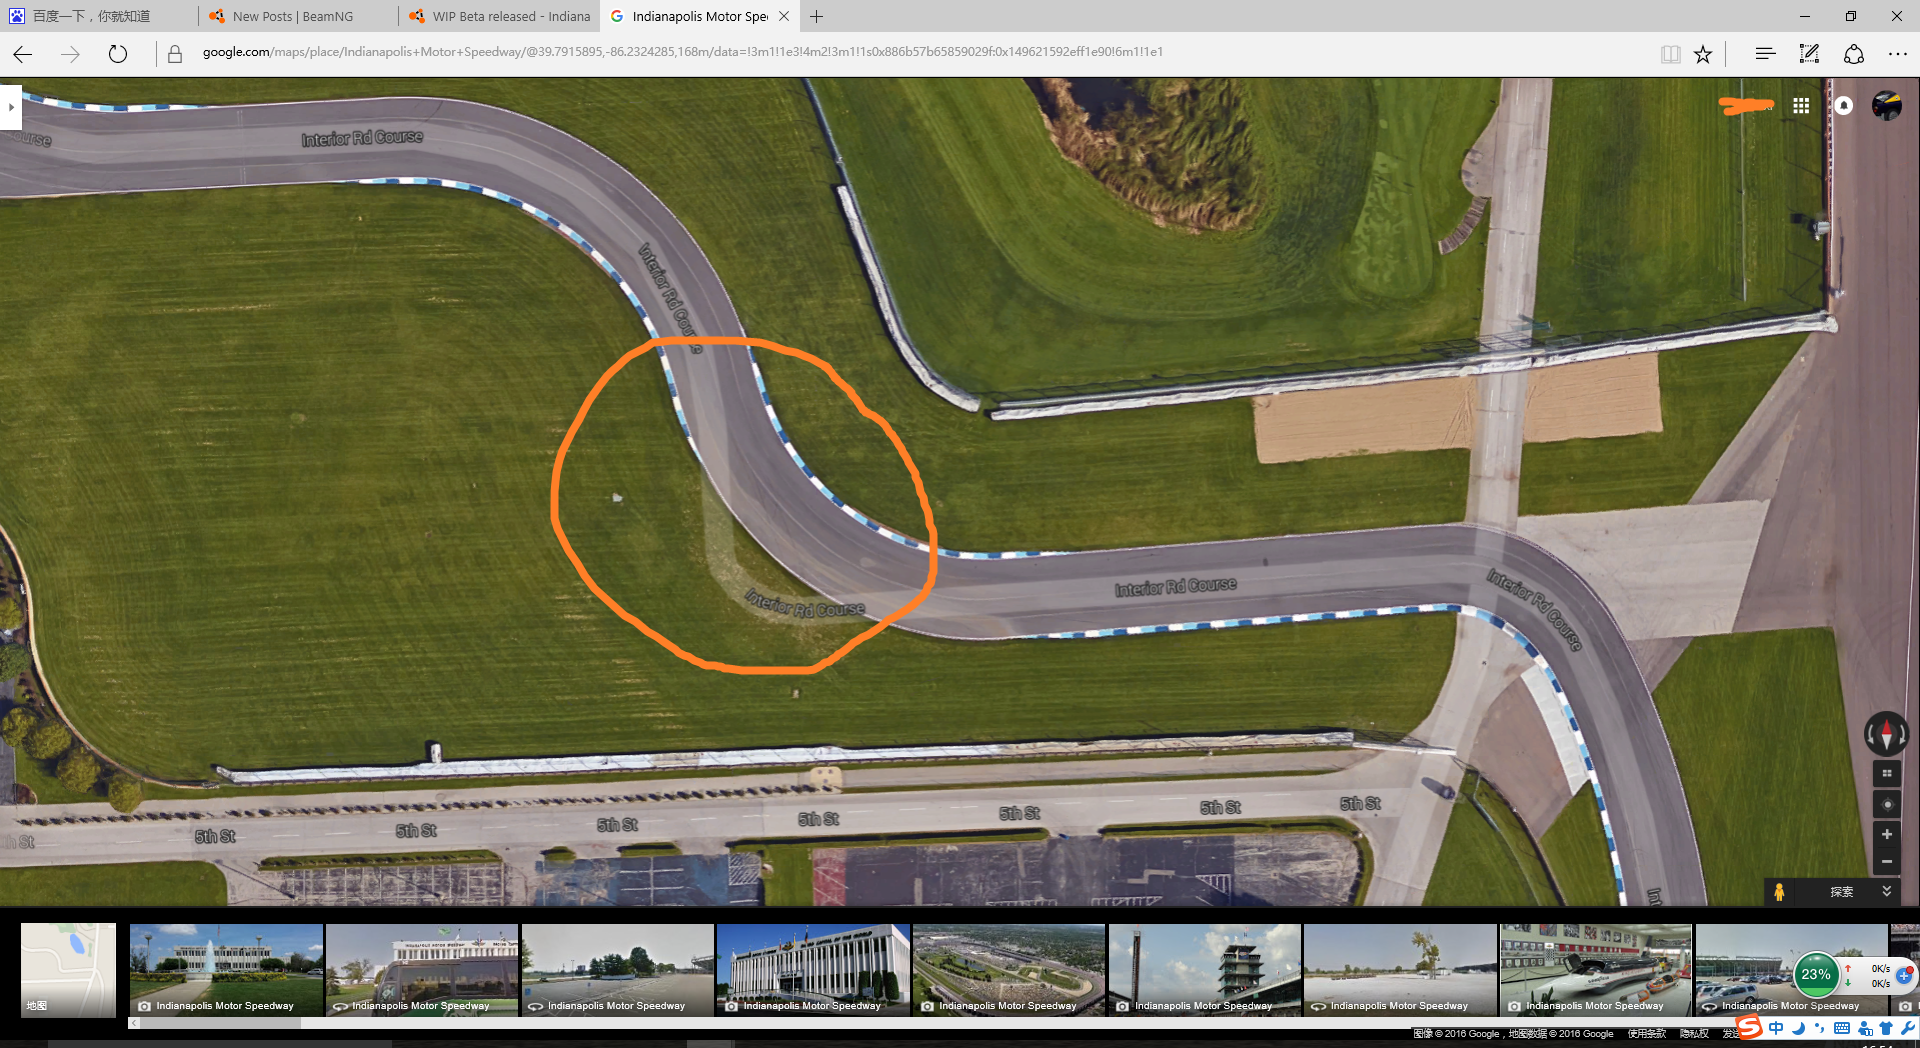 WIP Beta released - Indianapolis Motor Raceway   Page 2   BeamNG Indianapolis Motor Sdway Map on indianapolis fuel, indianapolis seal, indianapolis life, indianapolis cars,